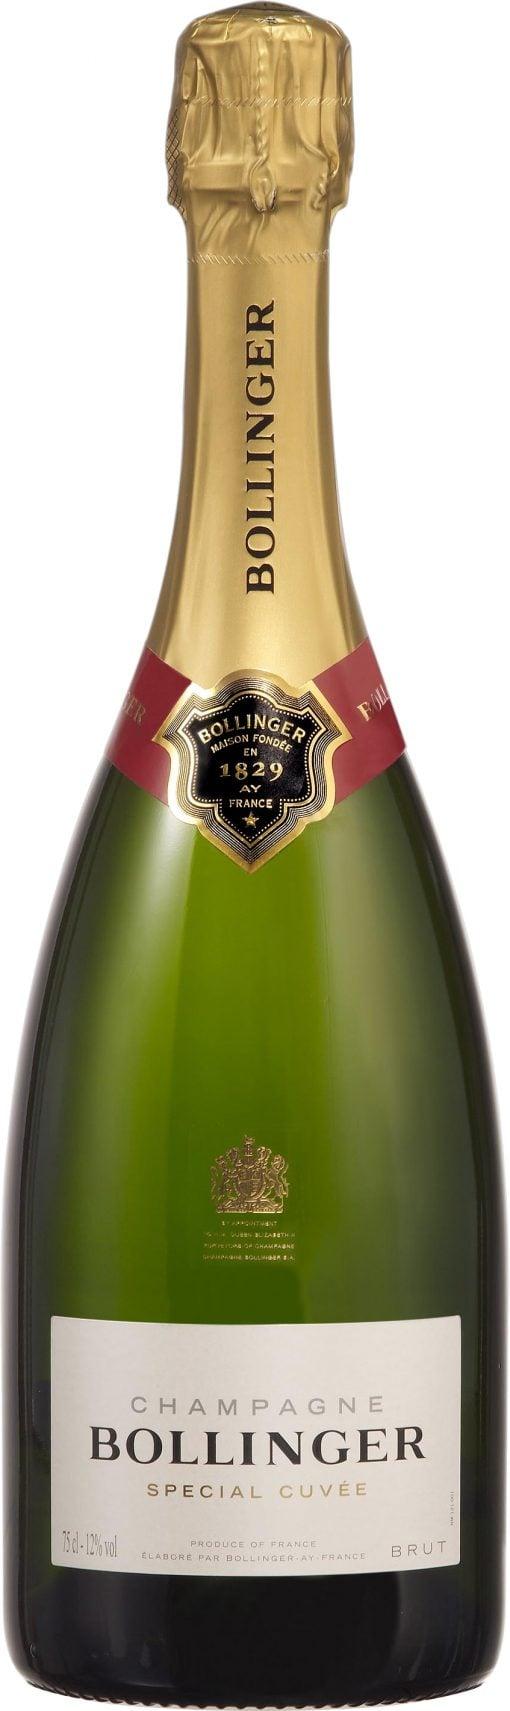 Bollinger - Special Cuvee 75cl Bottle